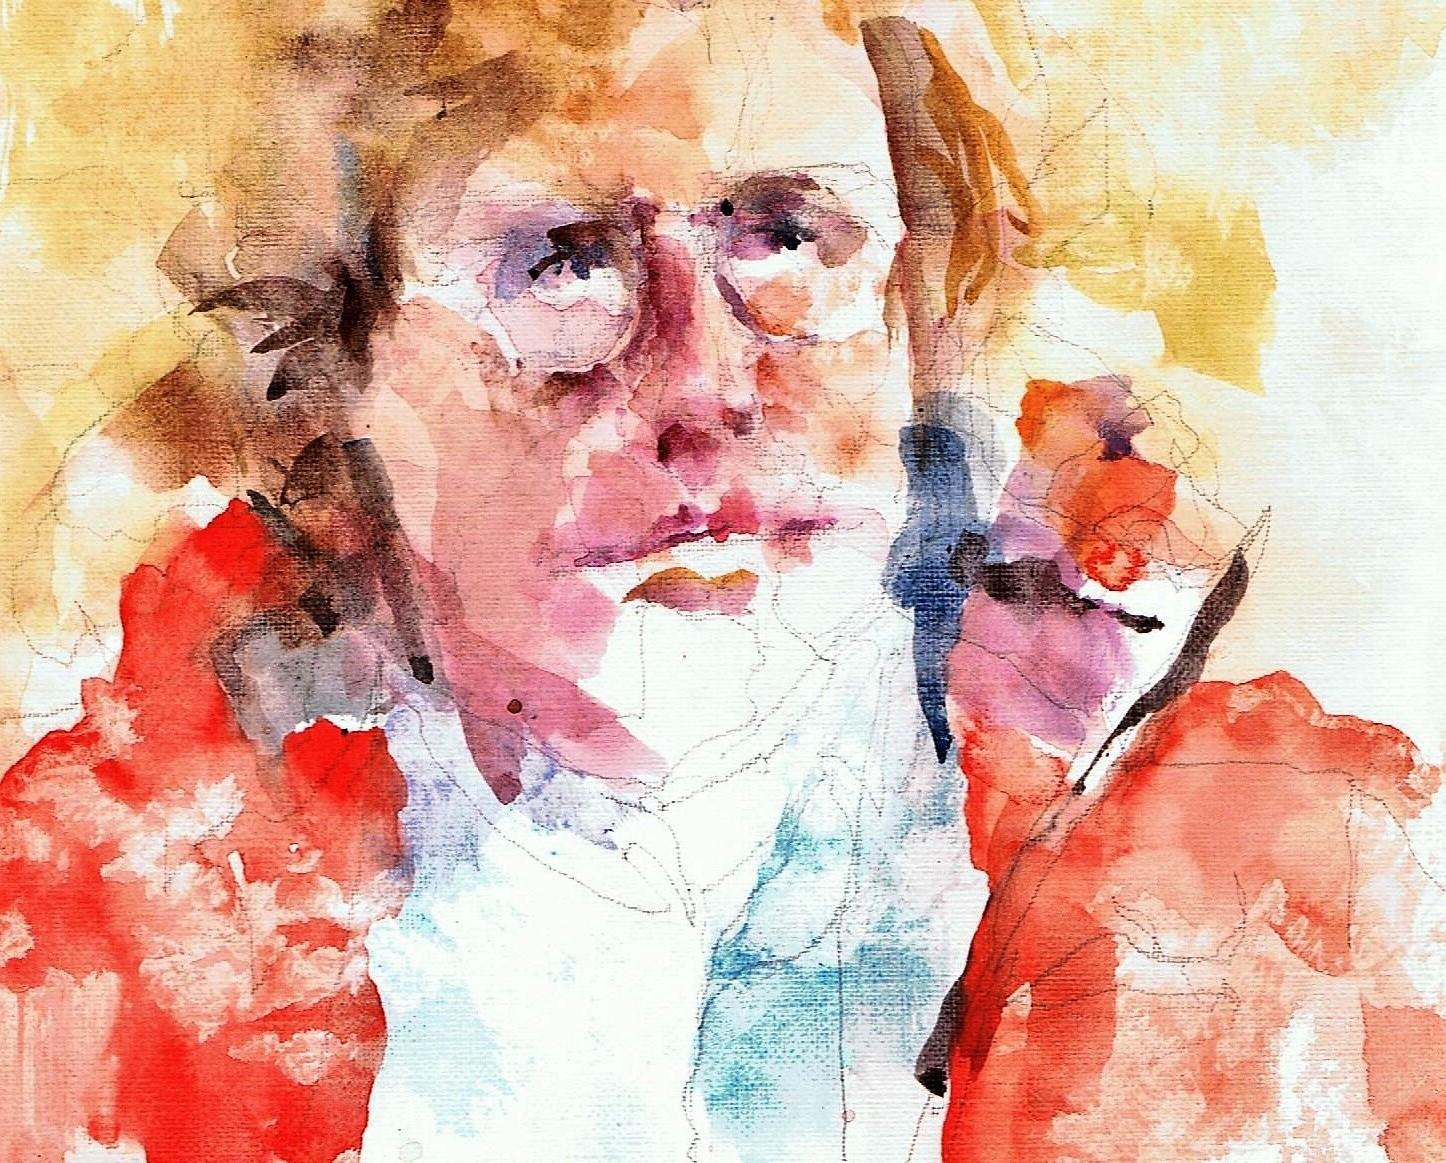 365 dagen een portret Friso Tekening 19c25